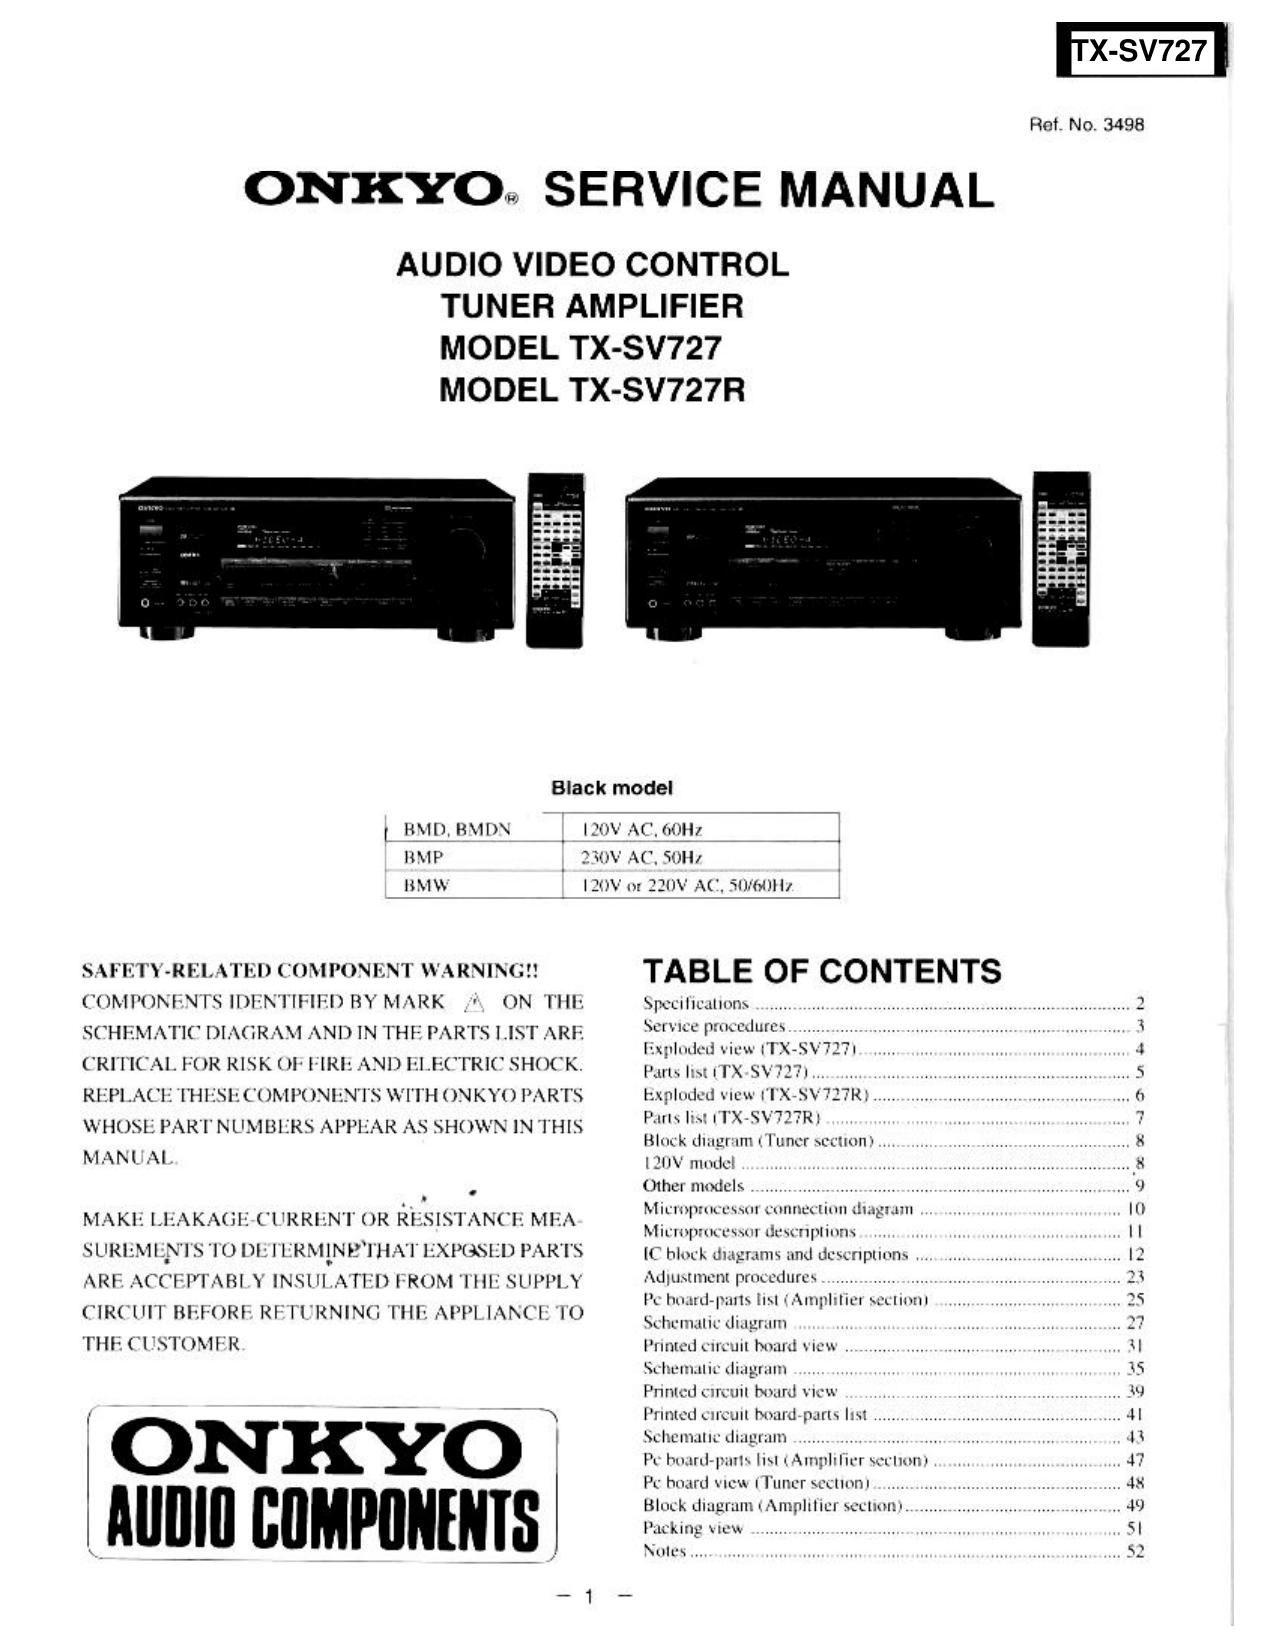 onkyo txsv 727 service manual rh audioservicemanuals com Onkyo TX Nr 838 Onkyo TX Sv727